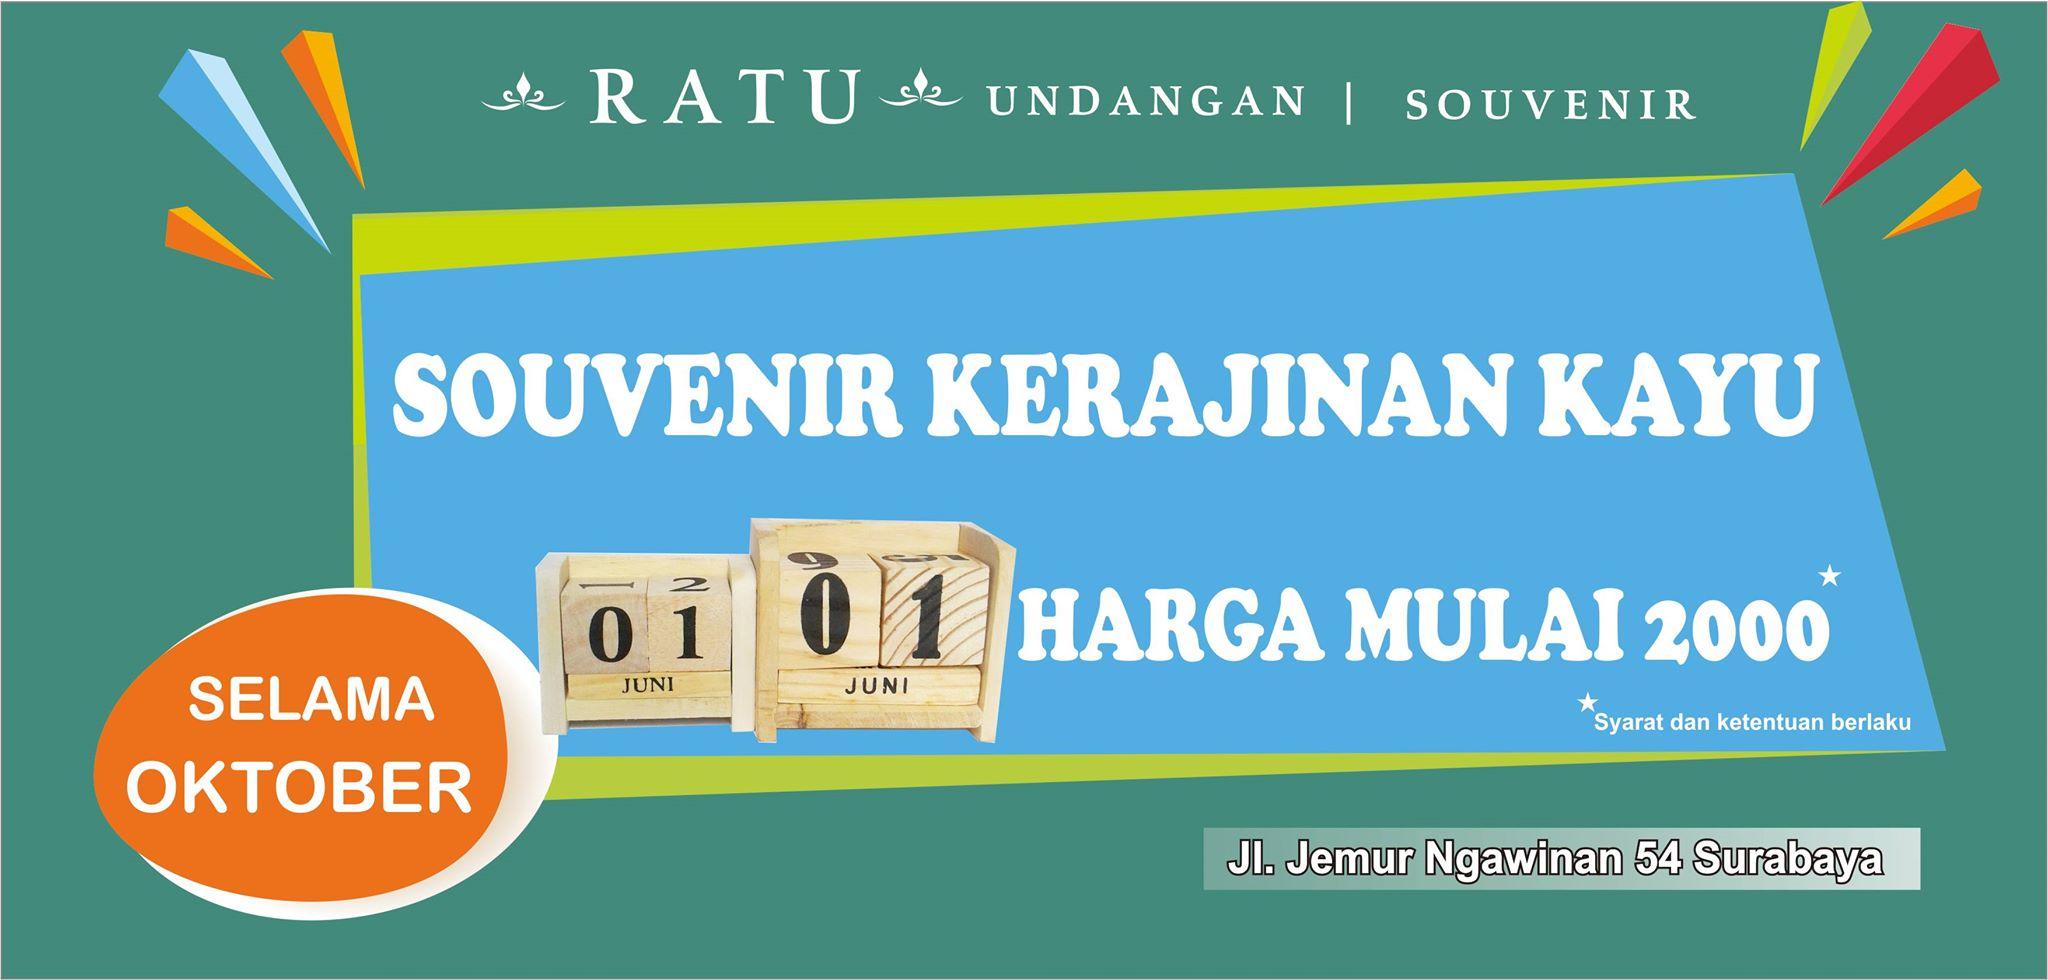 RATU UNDANGAN & SOUVENIR HP.085649411149 (WA)